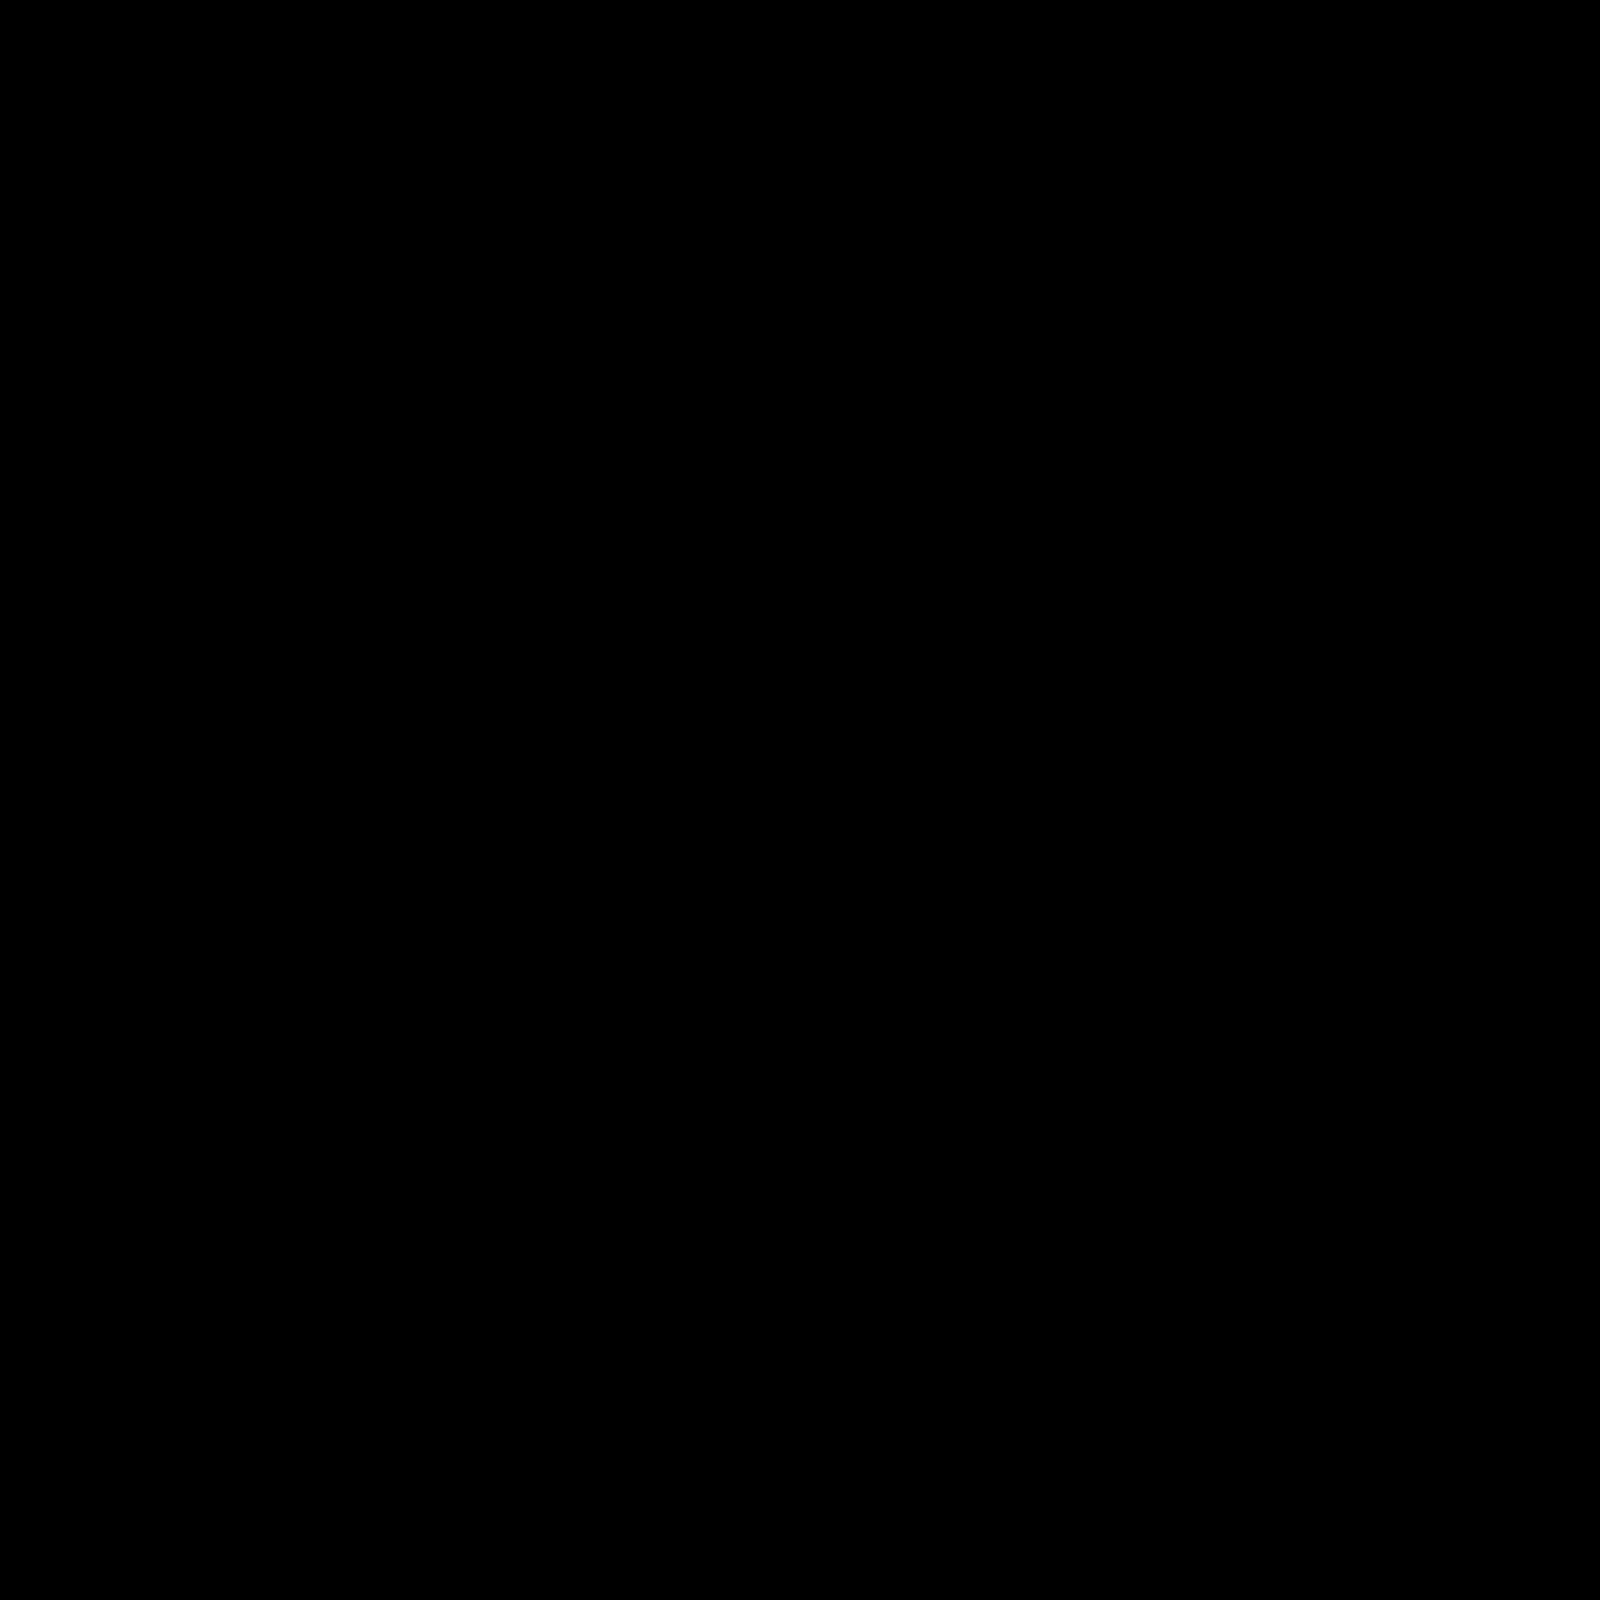 Buscar Chat icon